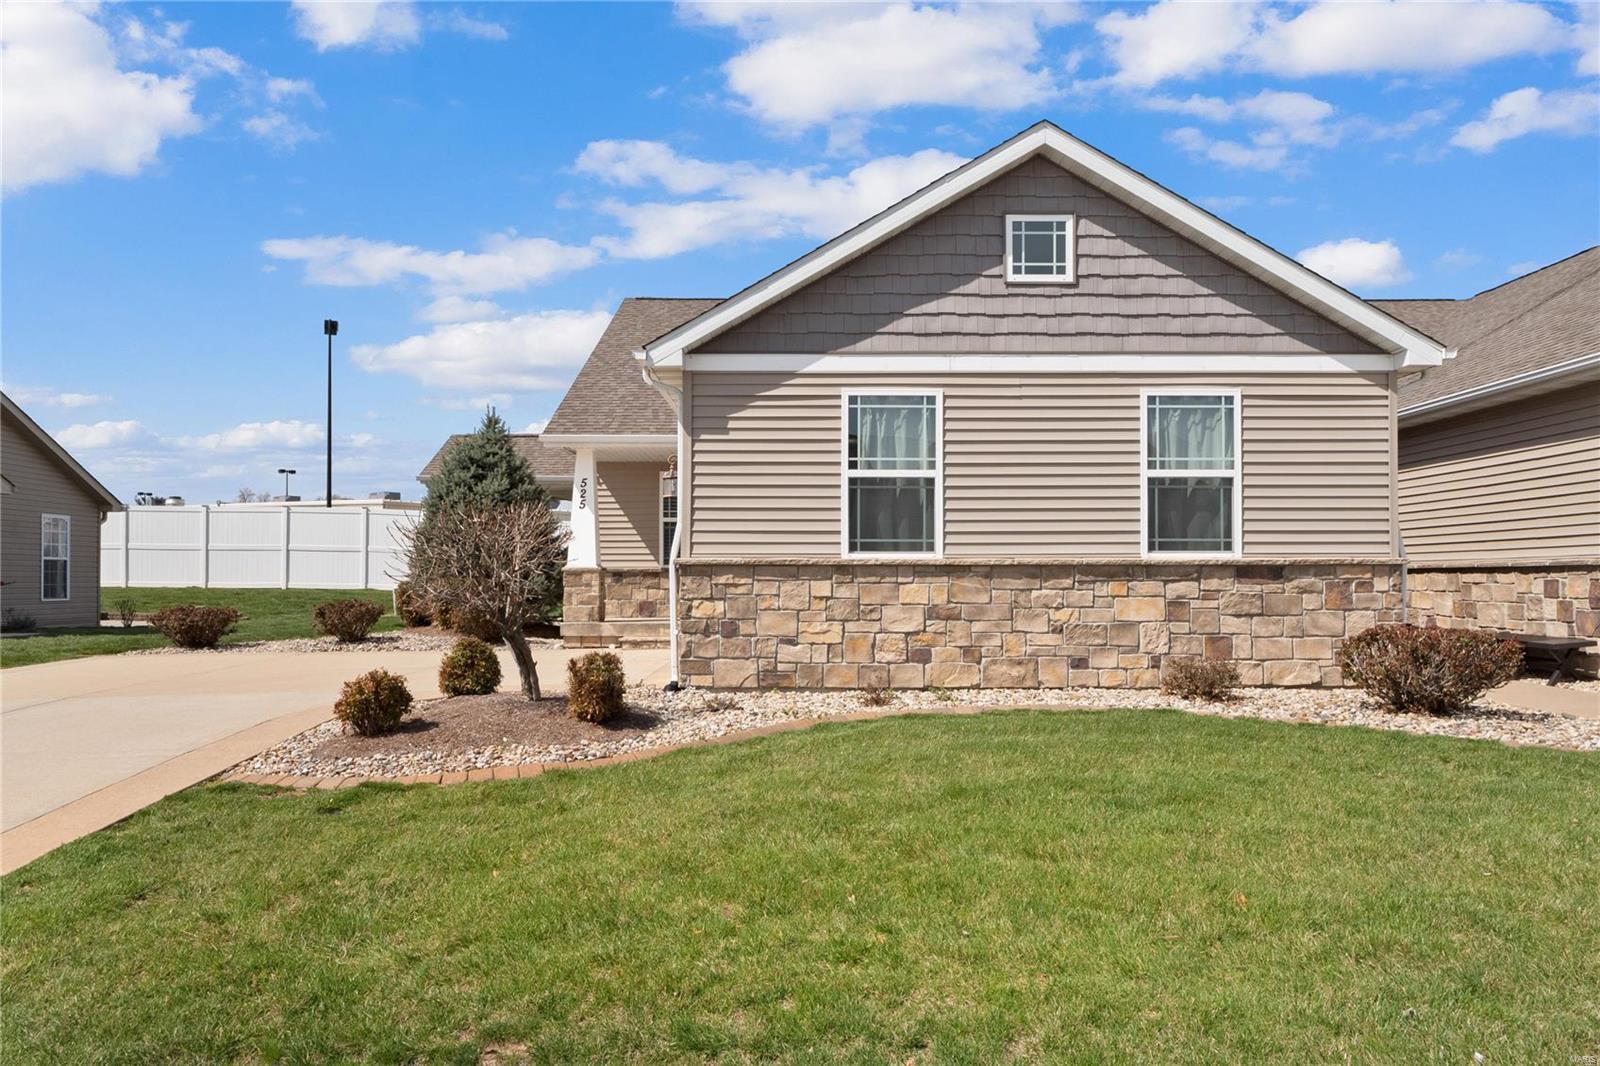 525 N Edison Street Property Photo - Freeburg, IL real estate listing